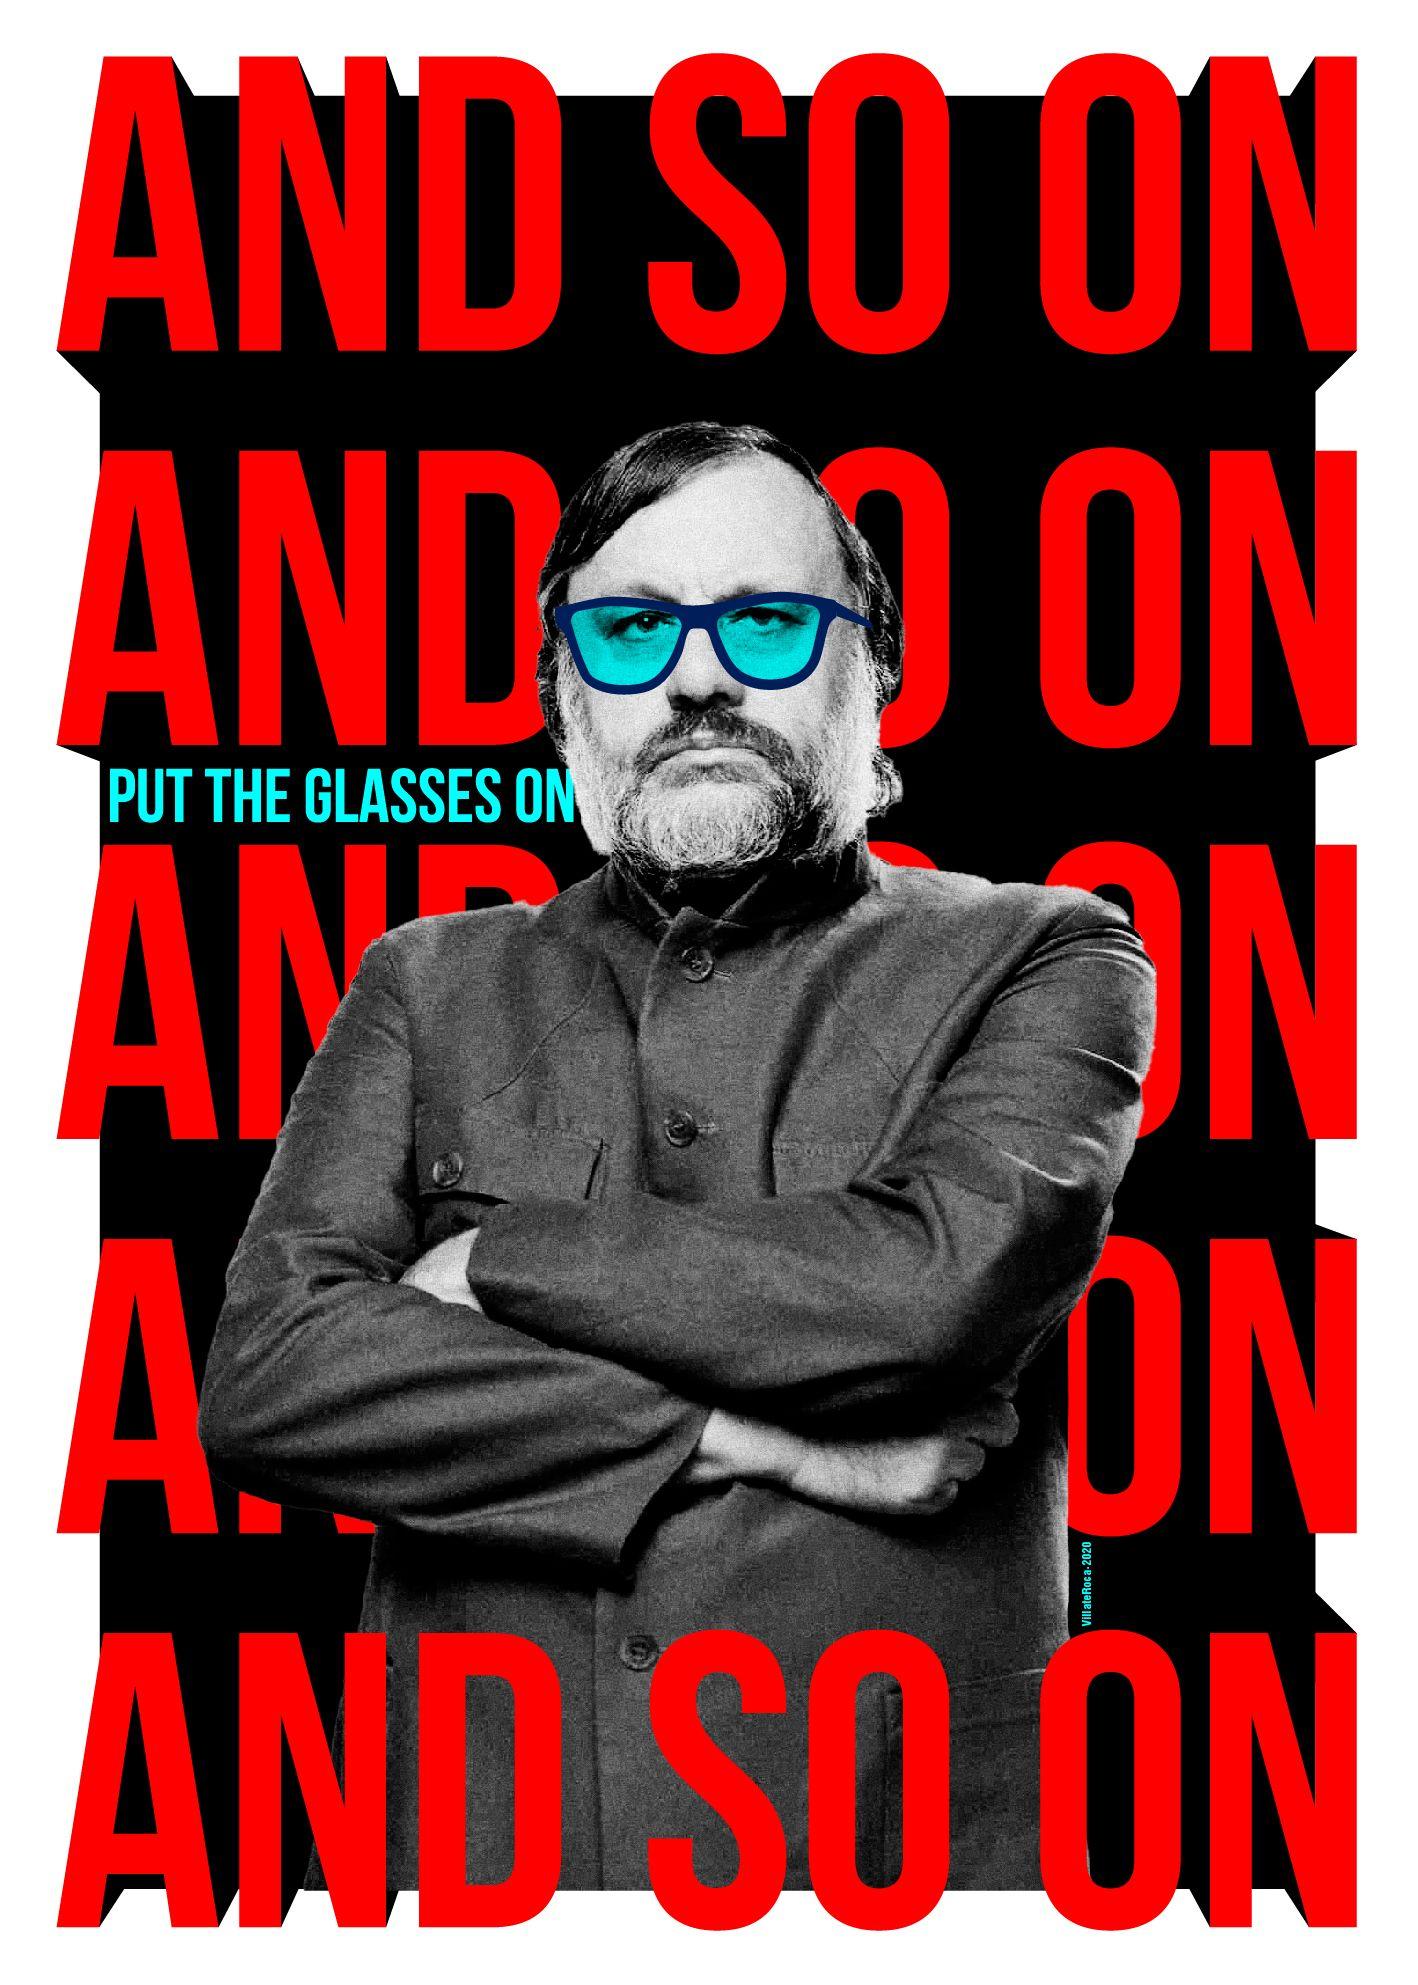 #Slavoj #Zizek #Phylosophy #Poster #PhotographyArt #Cartel #Filosofia #AndSoOn #JohnNada #APervertsGuideToIdeology #GraphicDesign #DiseñoCubano #Typography #Tipografia